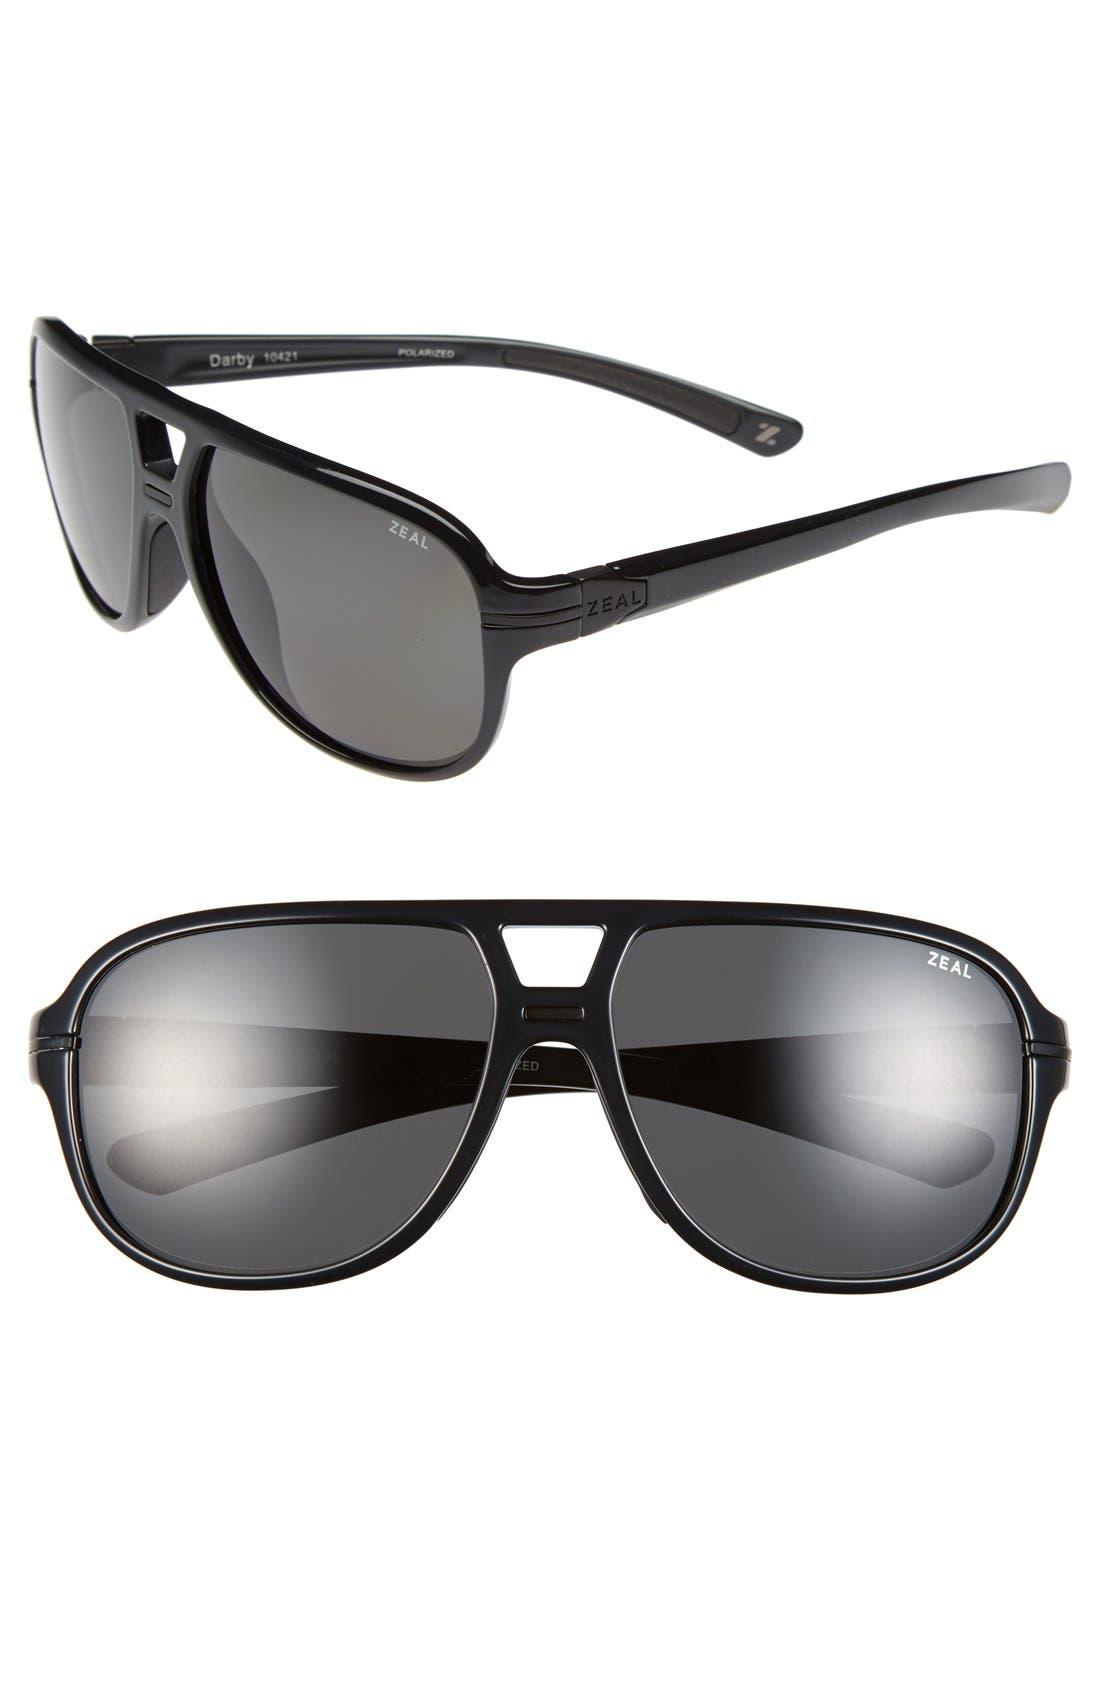 Alternate Image 1 Selected - Zeal Optics 'Darby' 60mm Polarized Plant Based Aviator Sunglasses